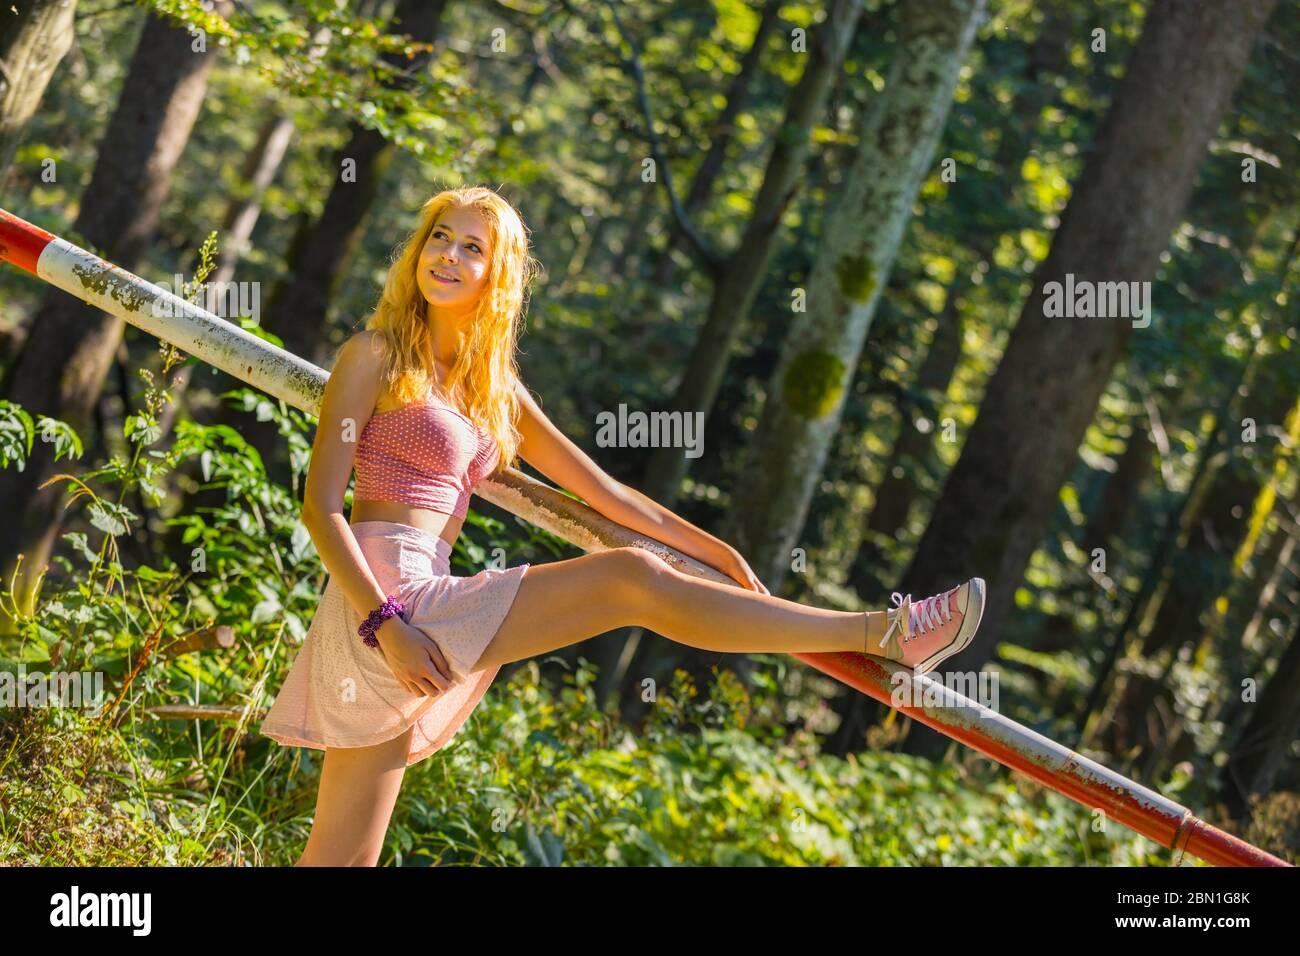 Teengirl blonde joyful in nature raising leg high on offlimit off-limit pretending pretend to cross across above transpass looking back aside away Stock Photo